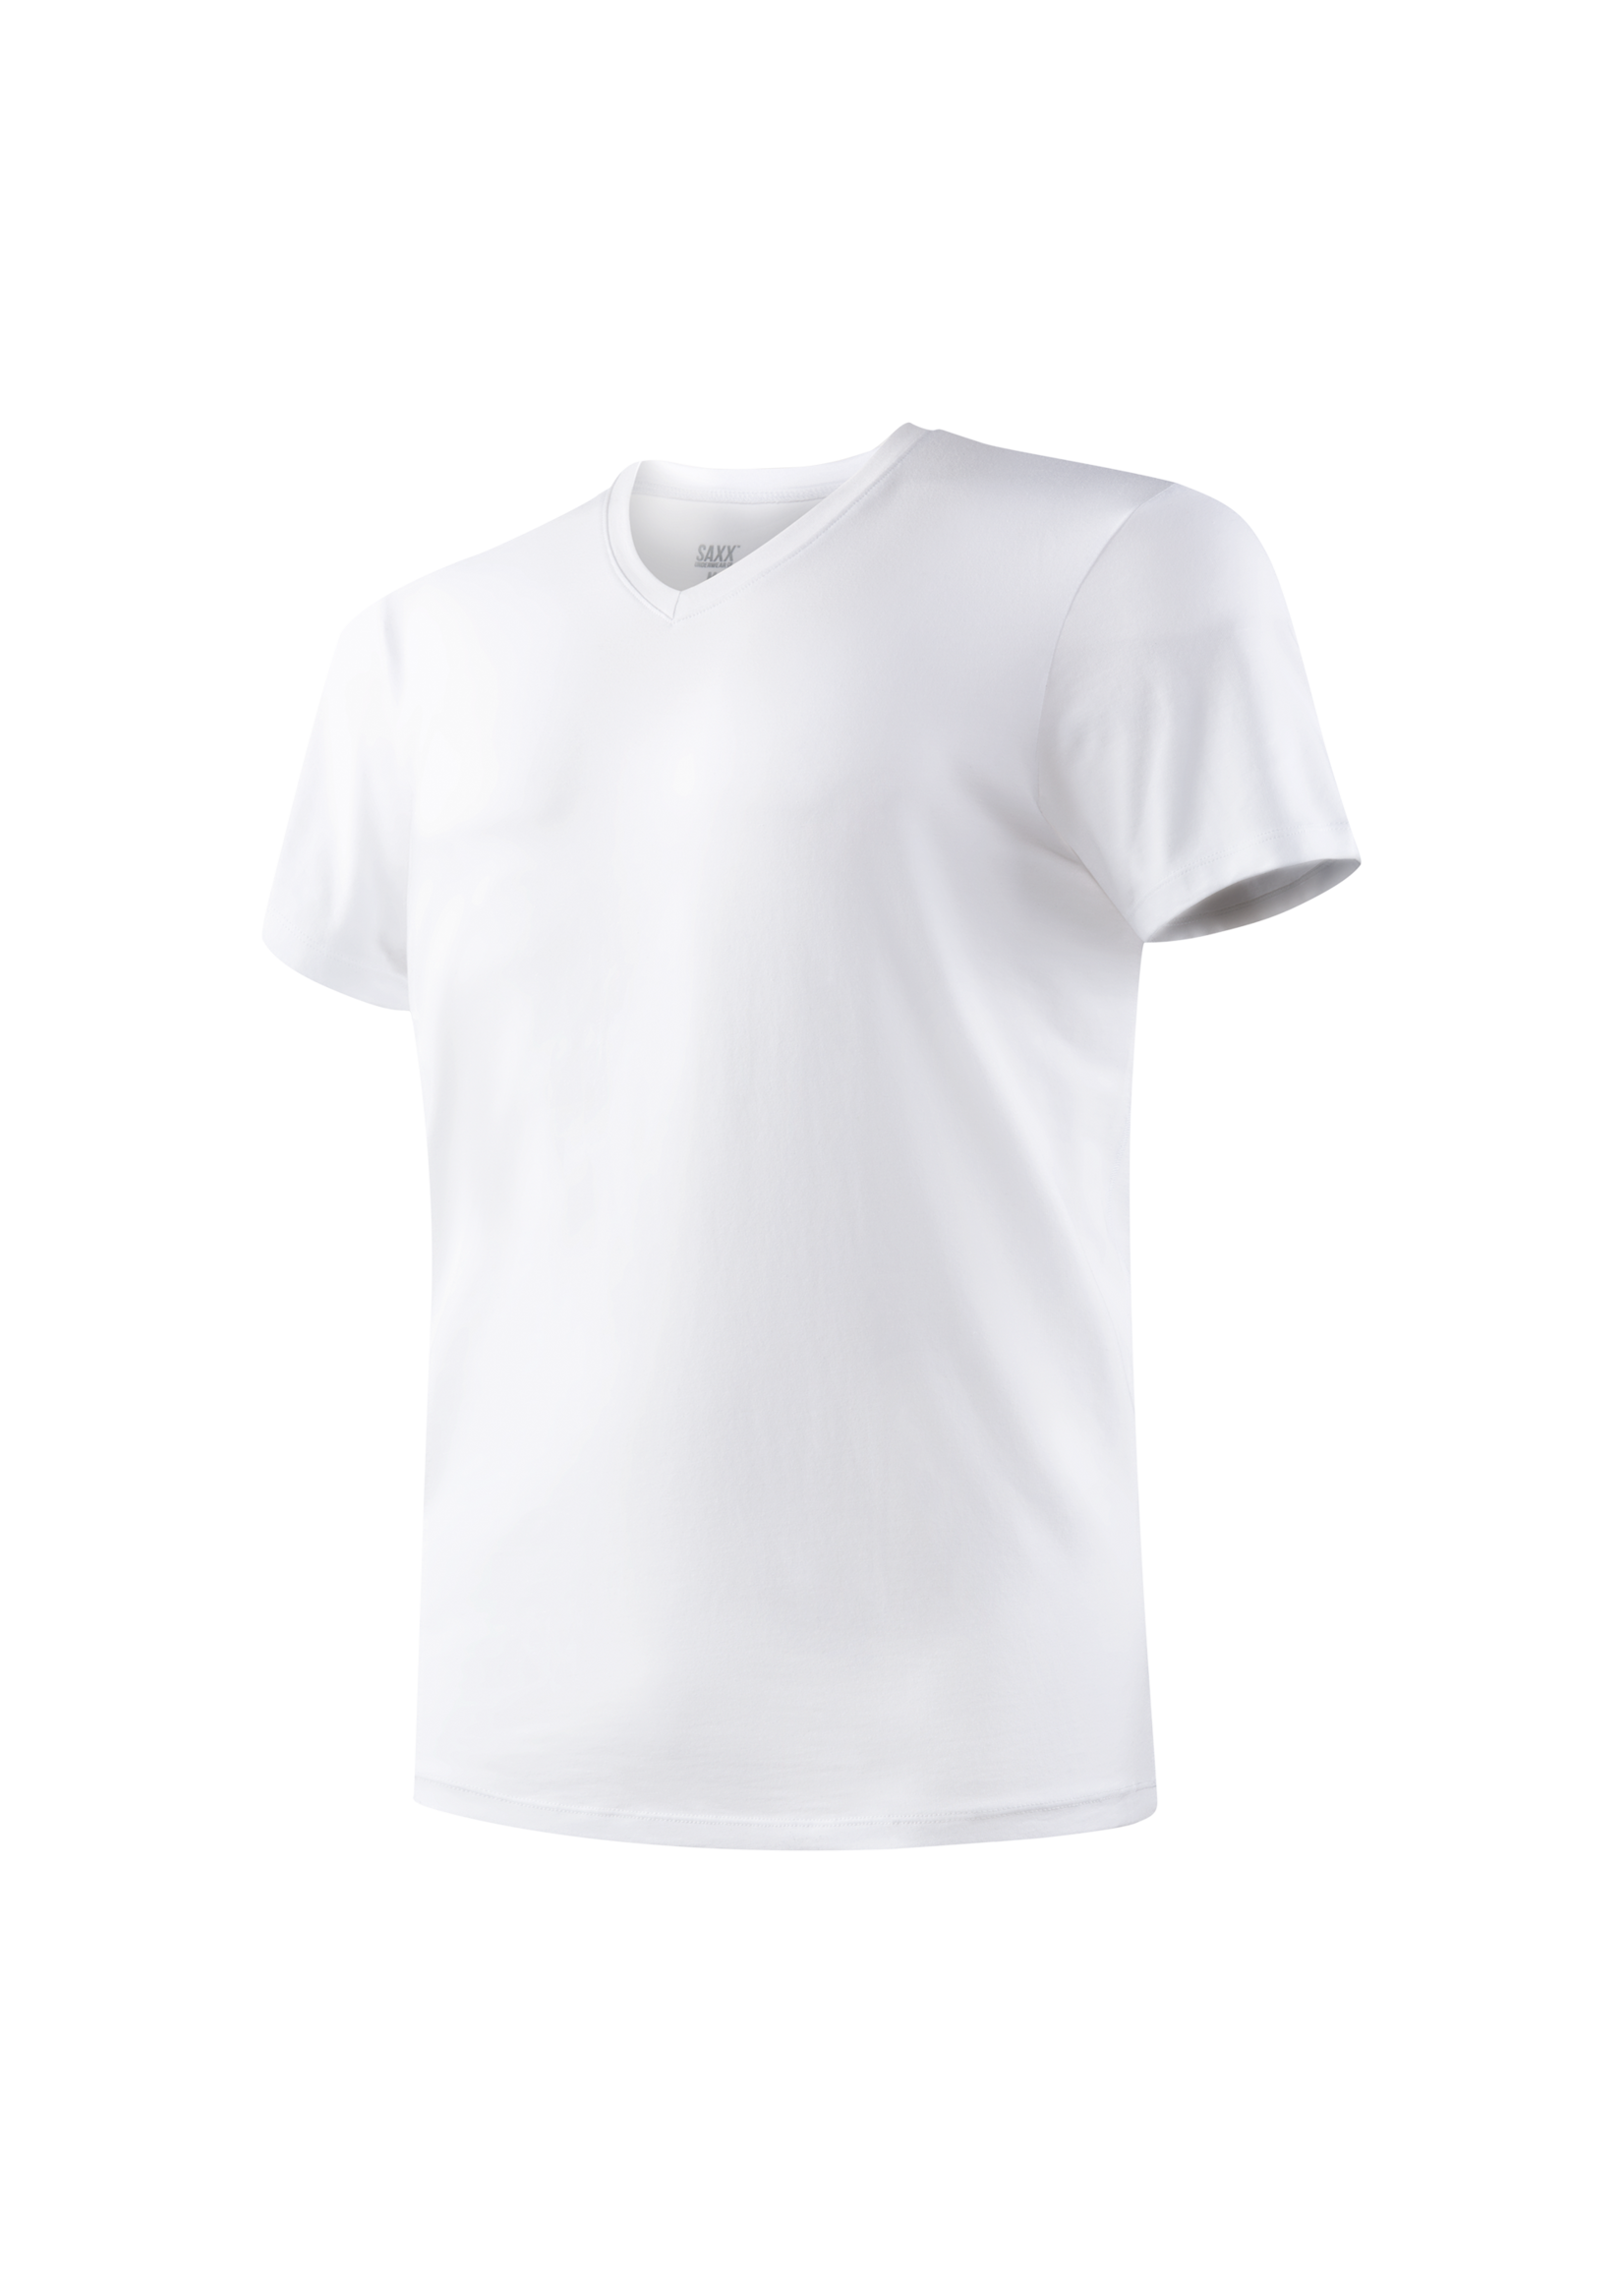 SAXX SAXX's Short Sleeve V-Neck Undershirt